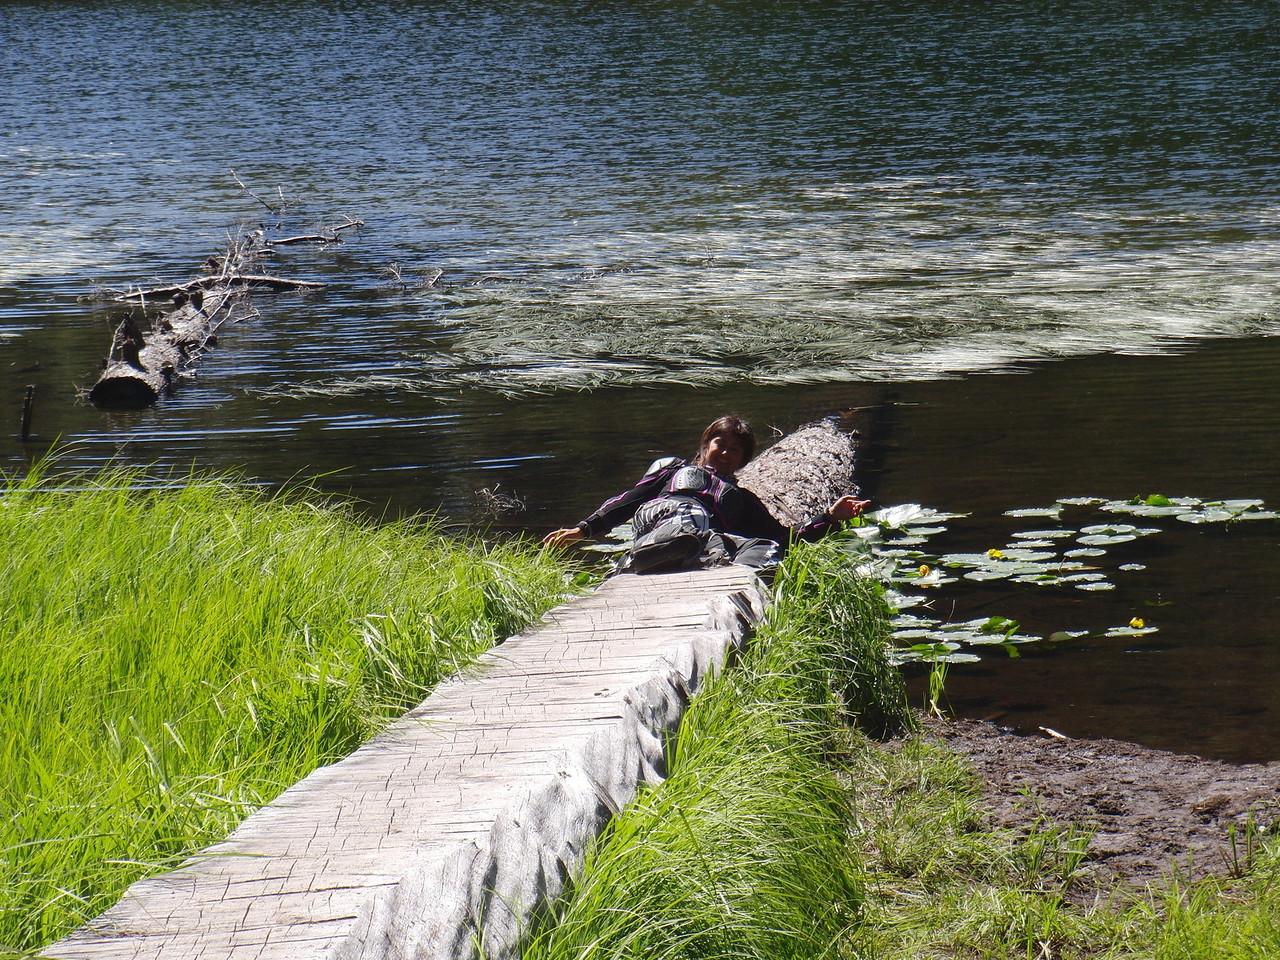 Antonella/Steamboat Lake